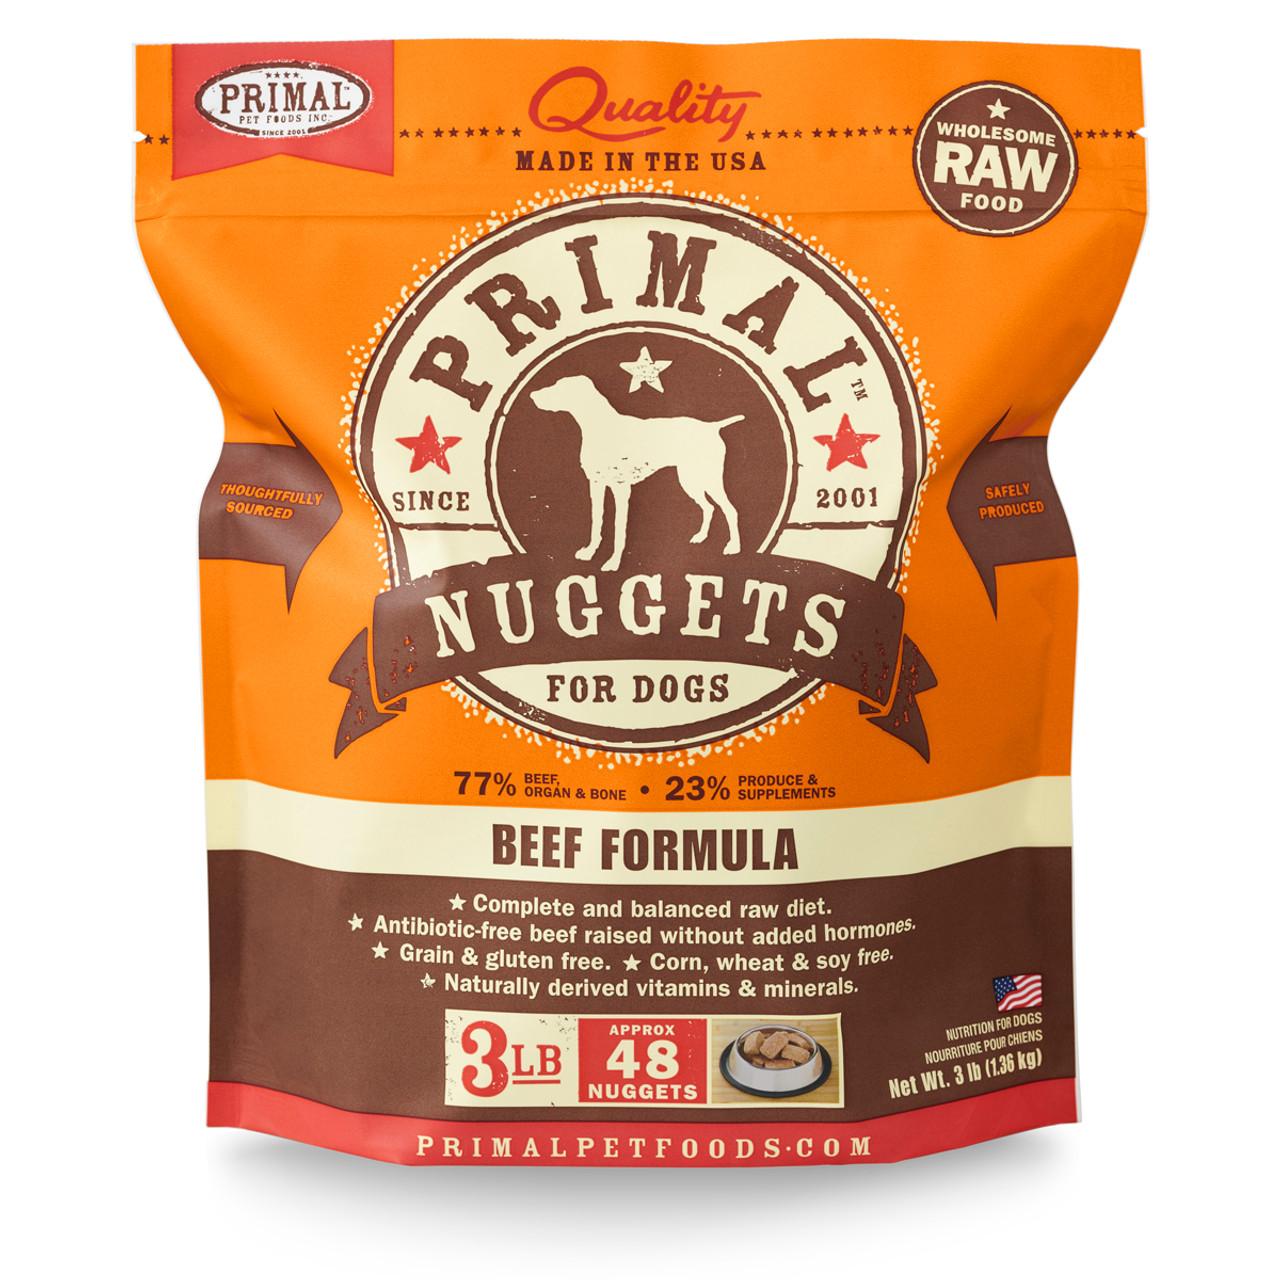 Primal Raw Frozen Canine Nuggets Beef Formula Dog Food